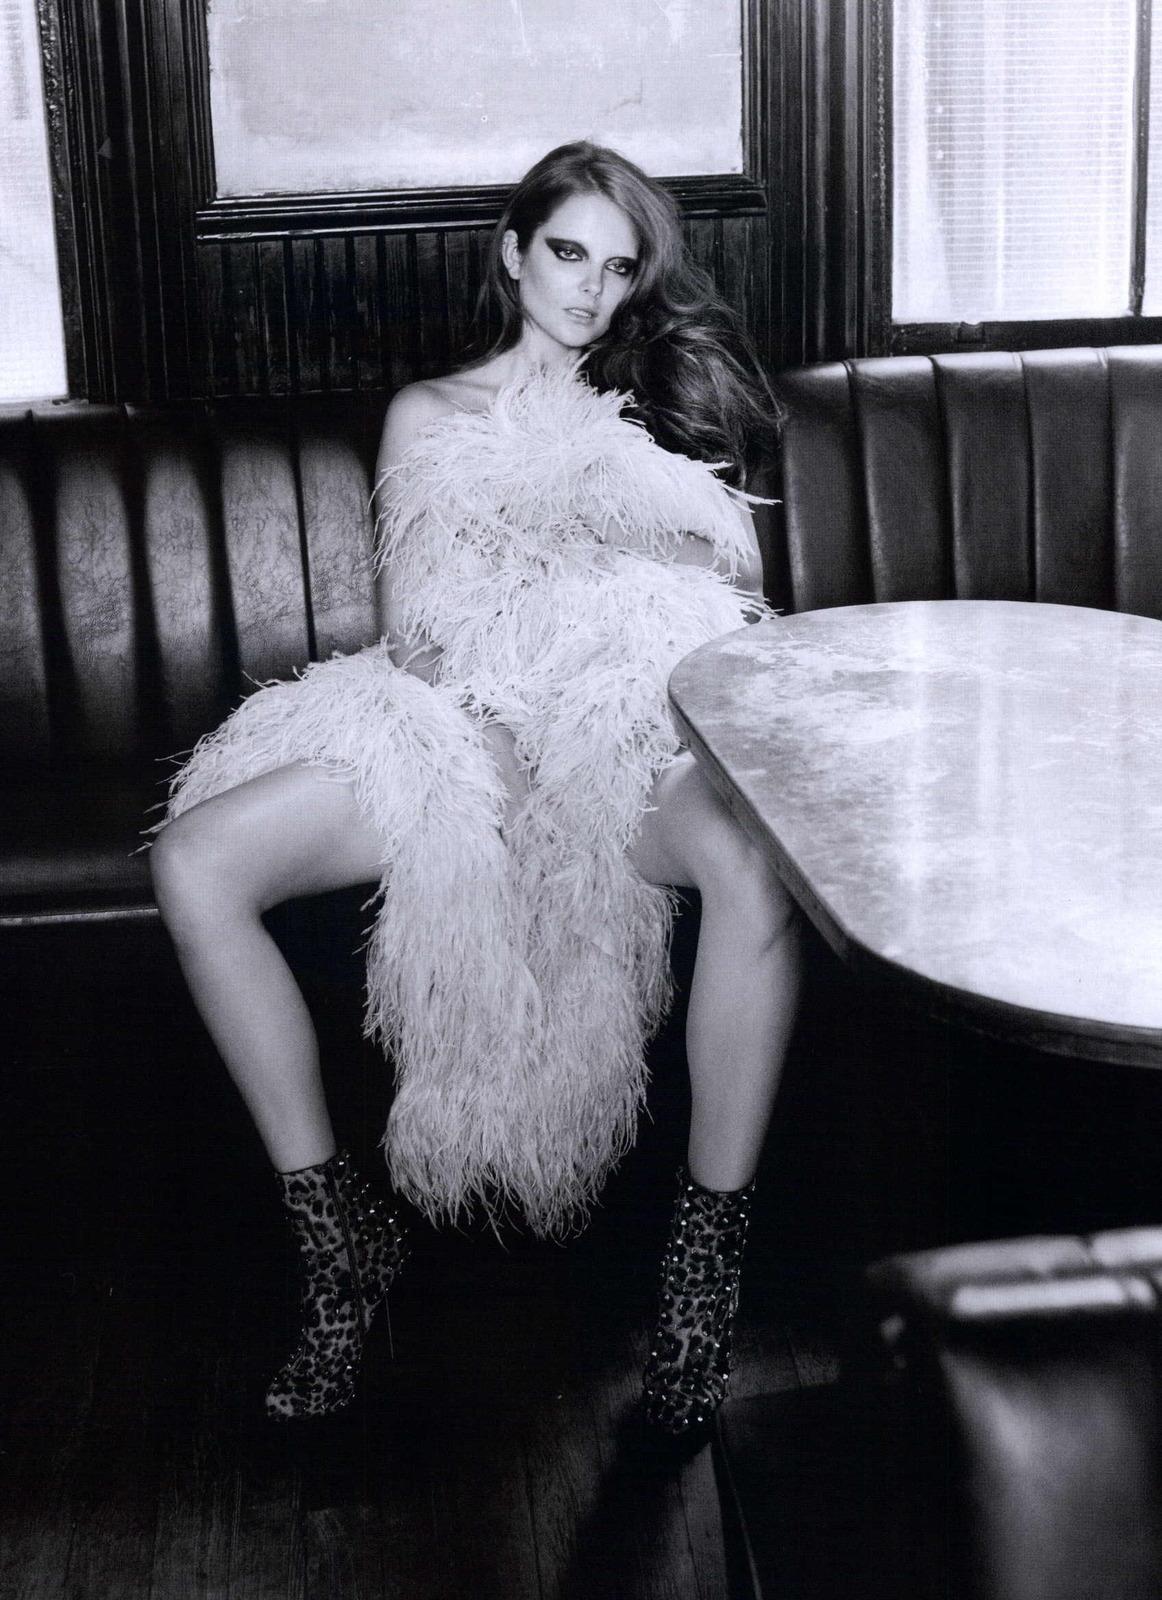 Paparazzi Julija Steponaviciute nudes (47 photo), Tits, Hot, Feet, cameltoe 2018